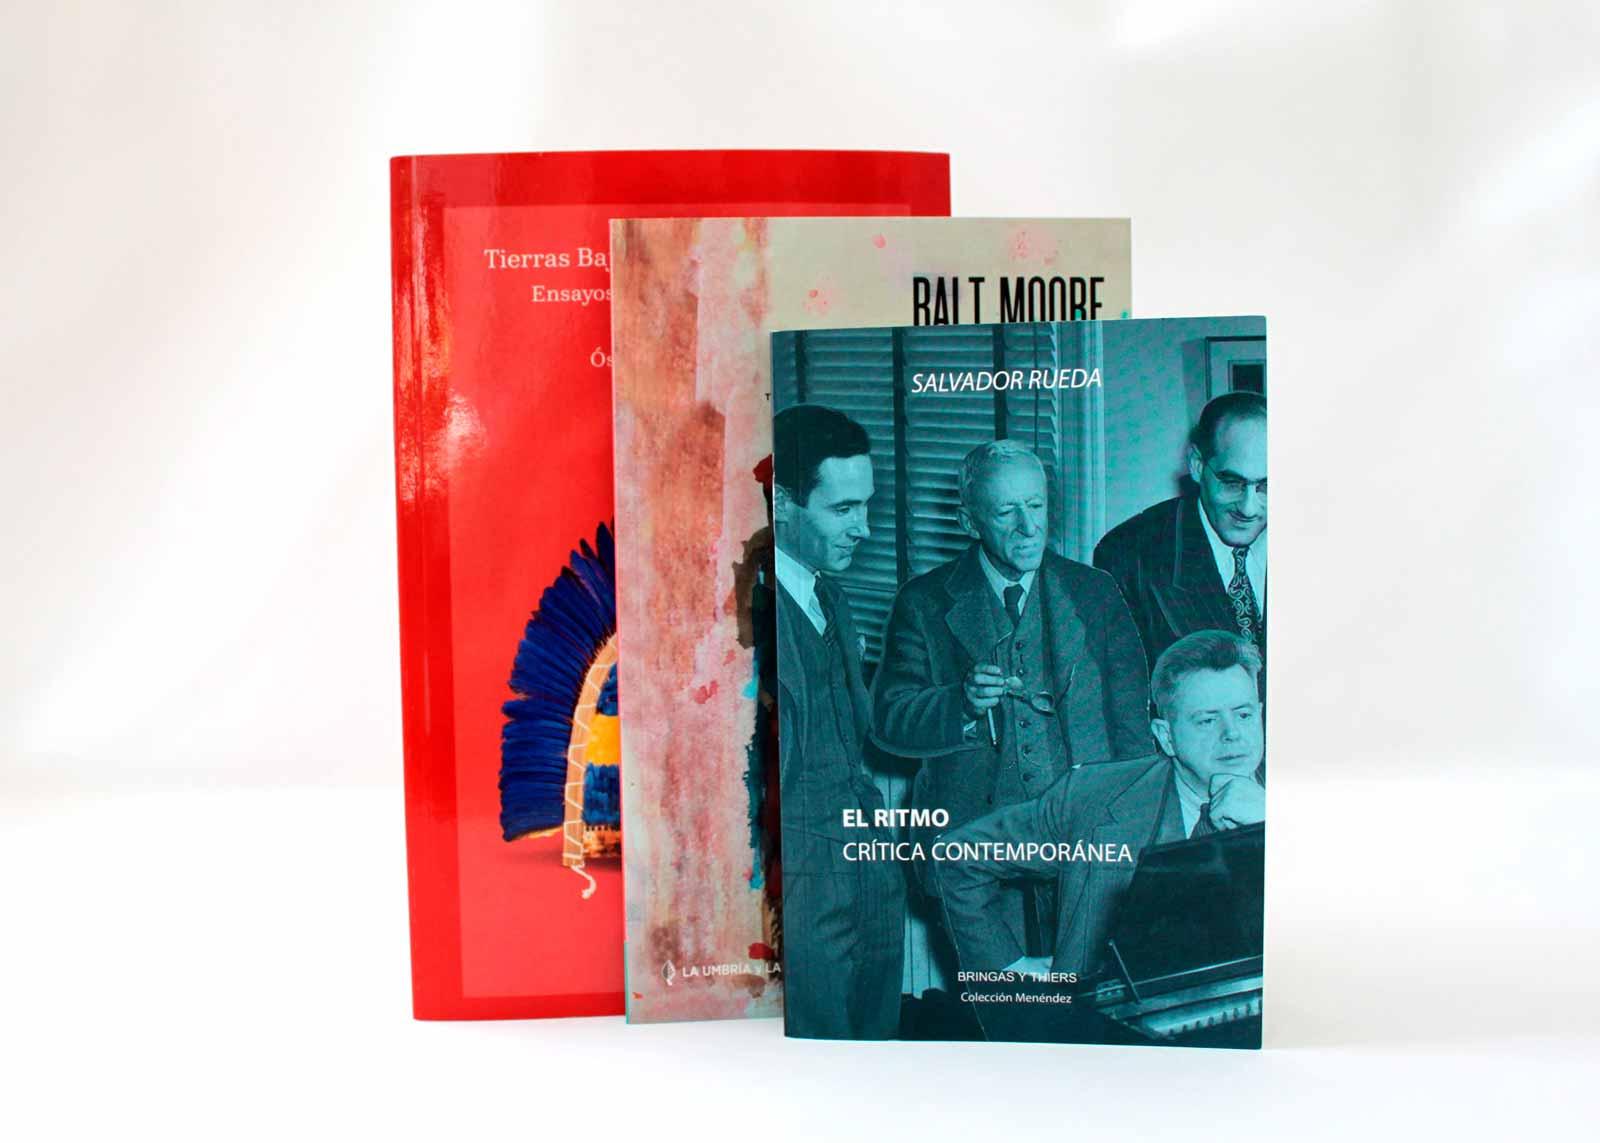 Impresión digital de libros, tapa blanda, encuadernación rústica